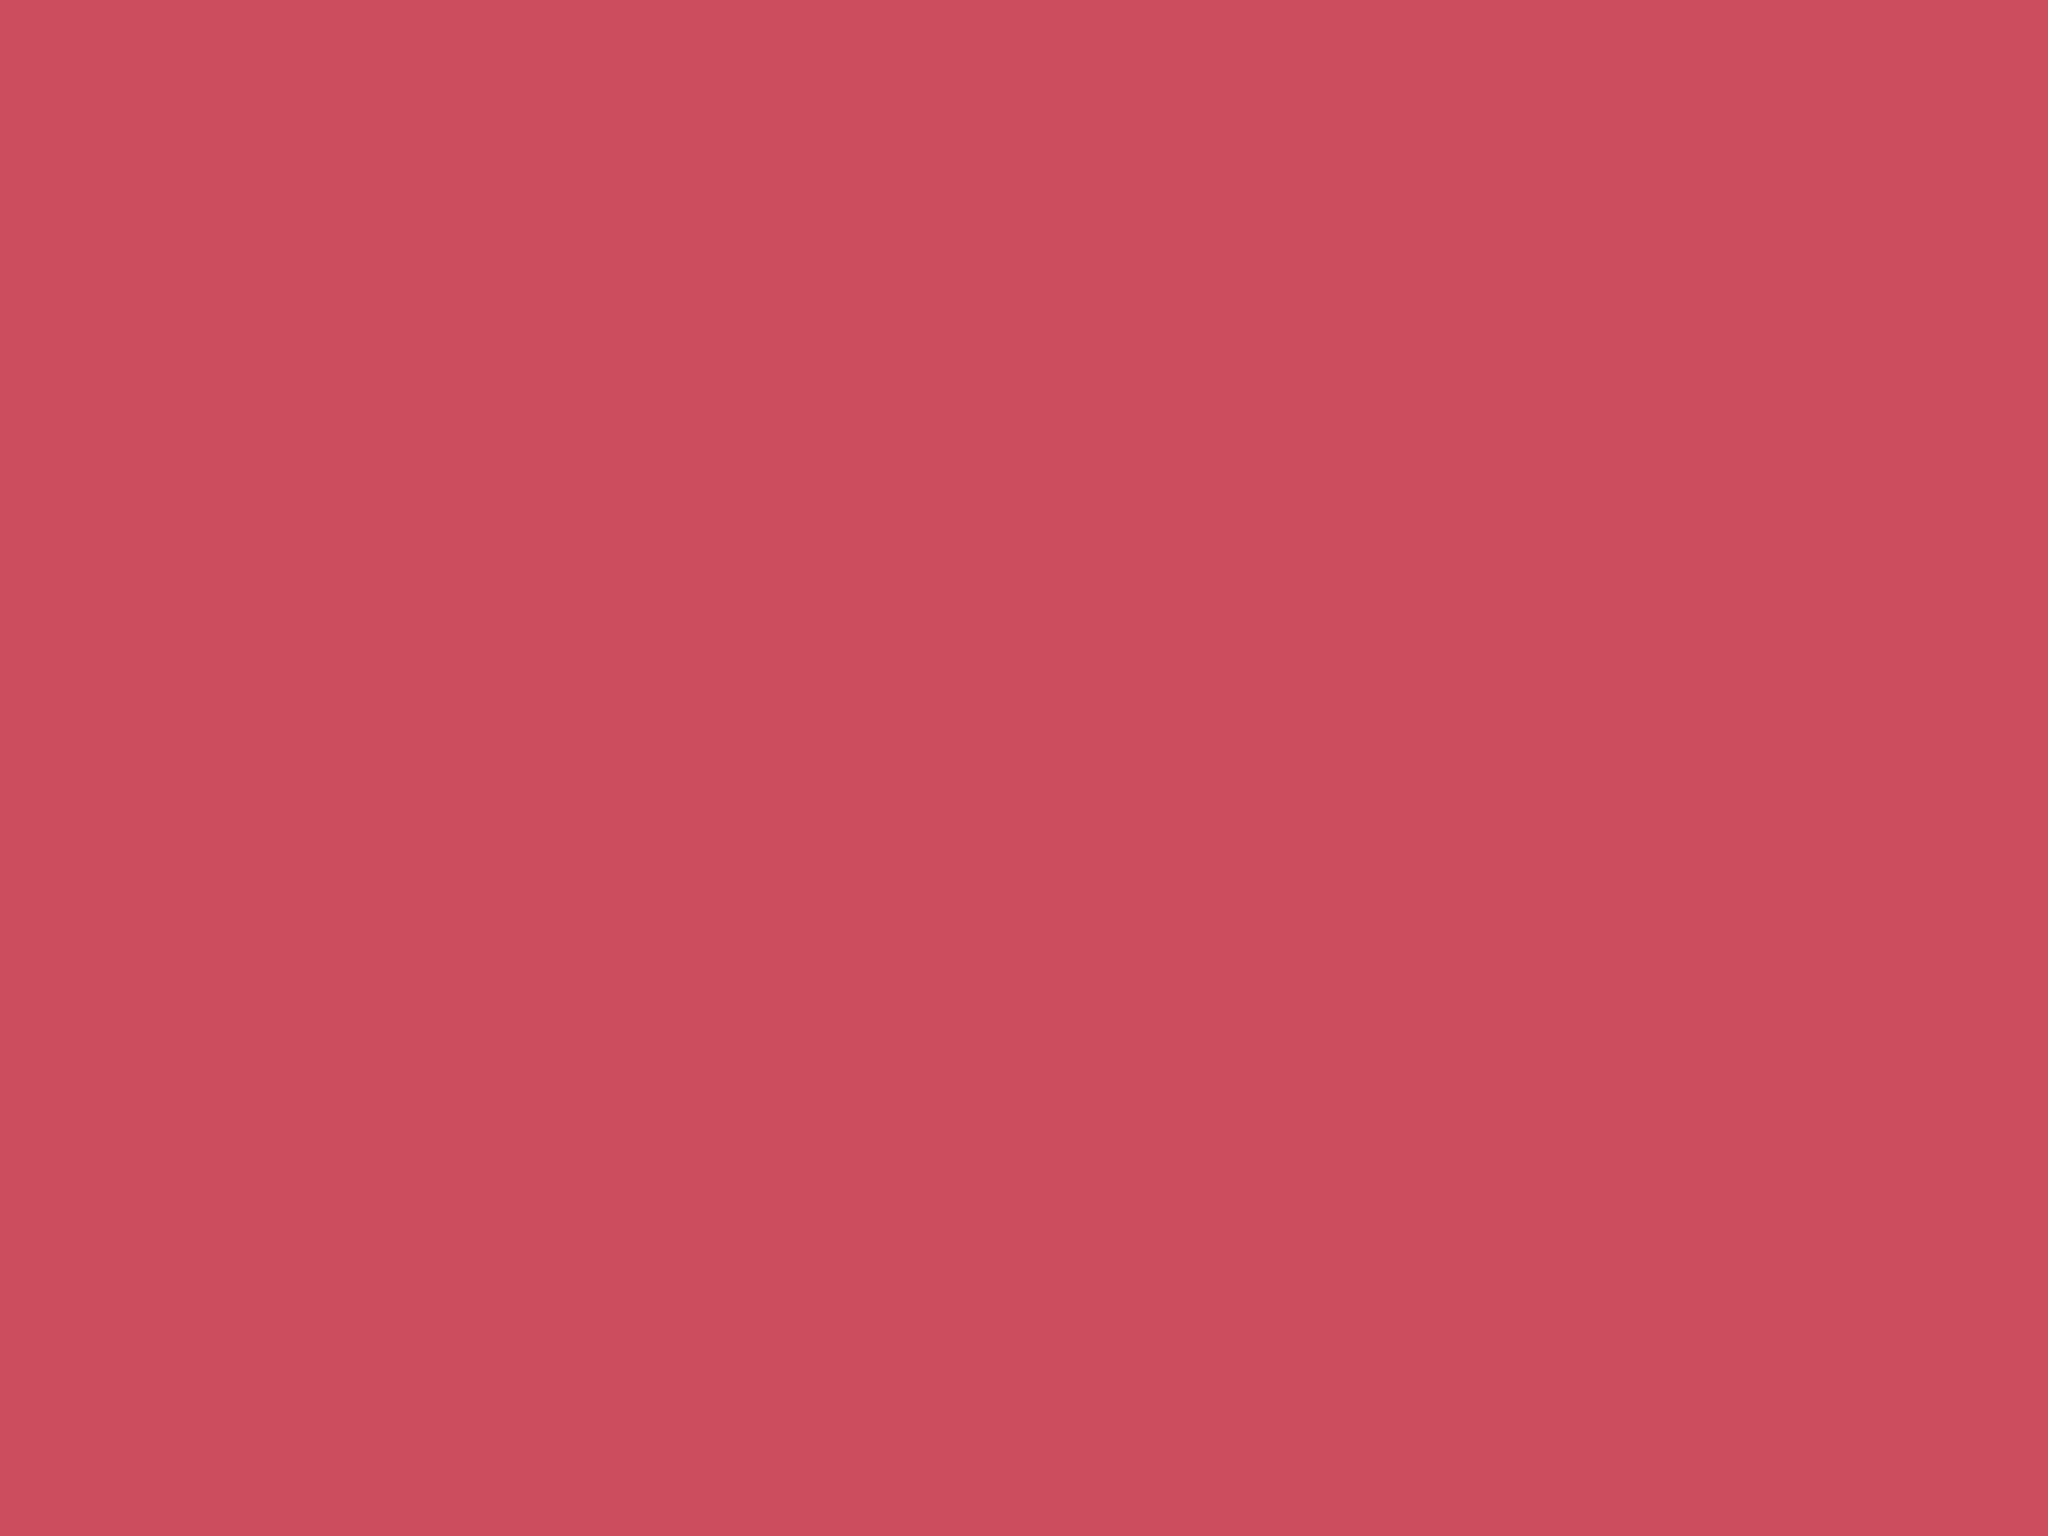 2048x1536 Dark Terra Cotta Solid Color Background